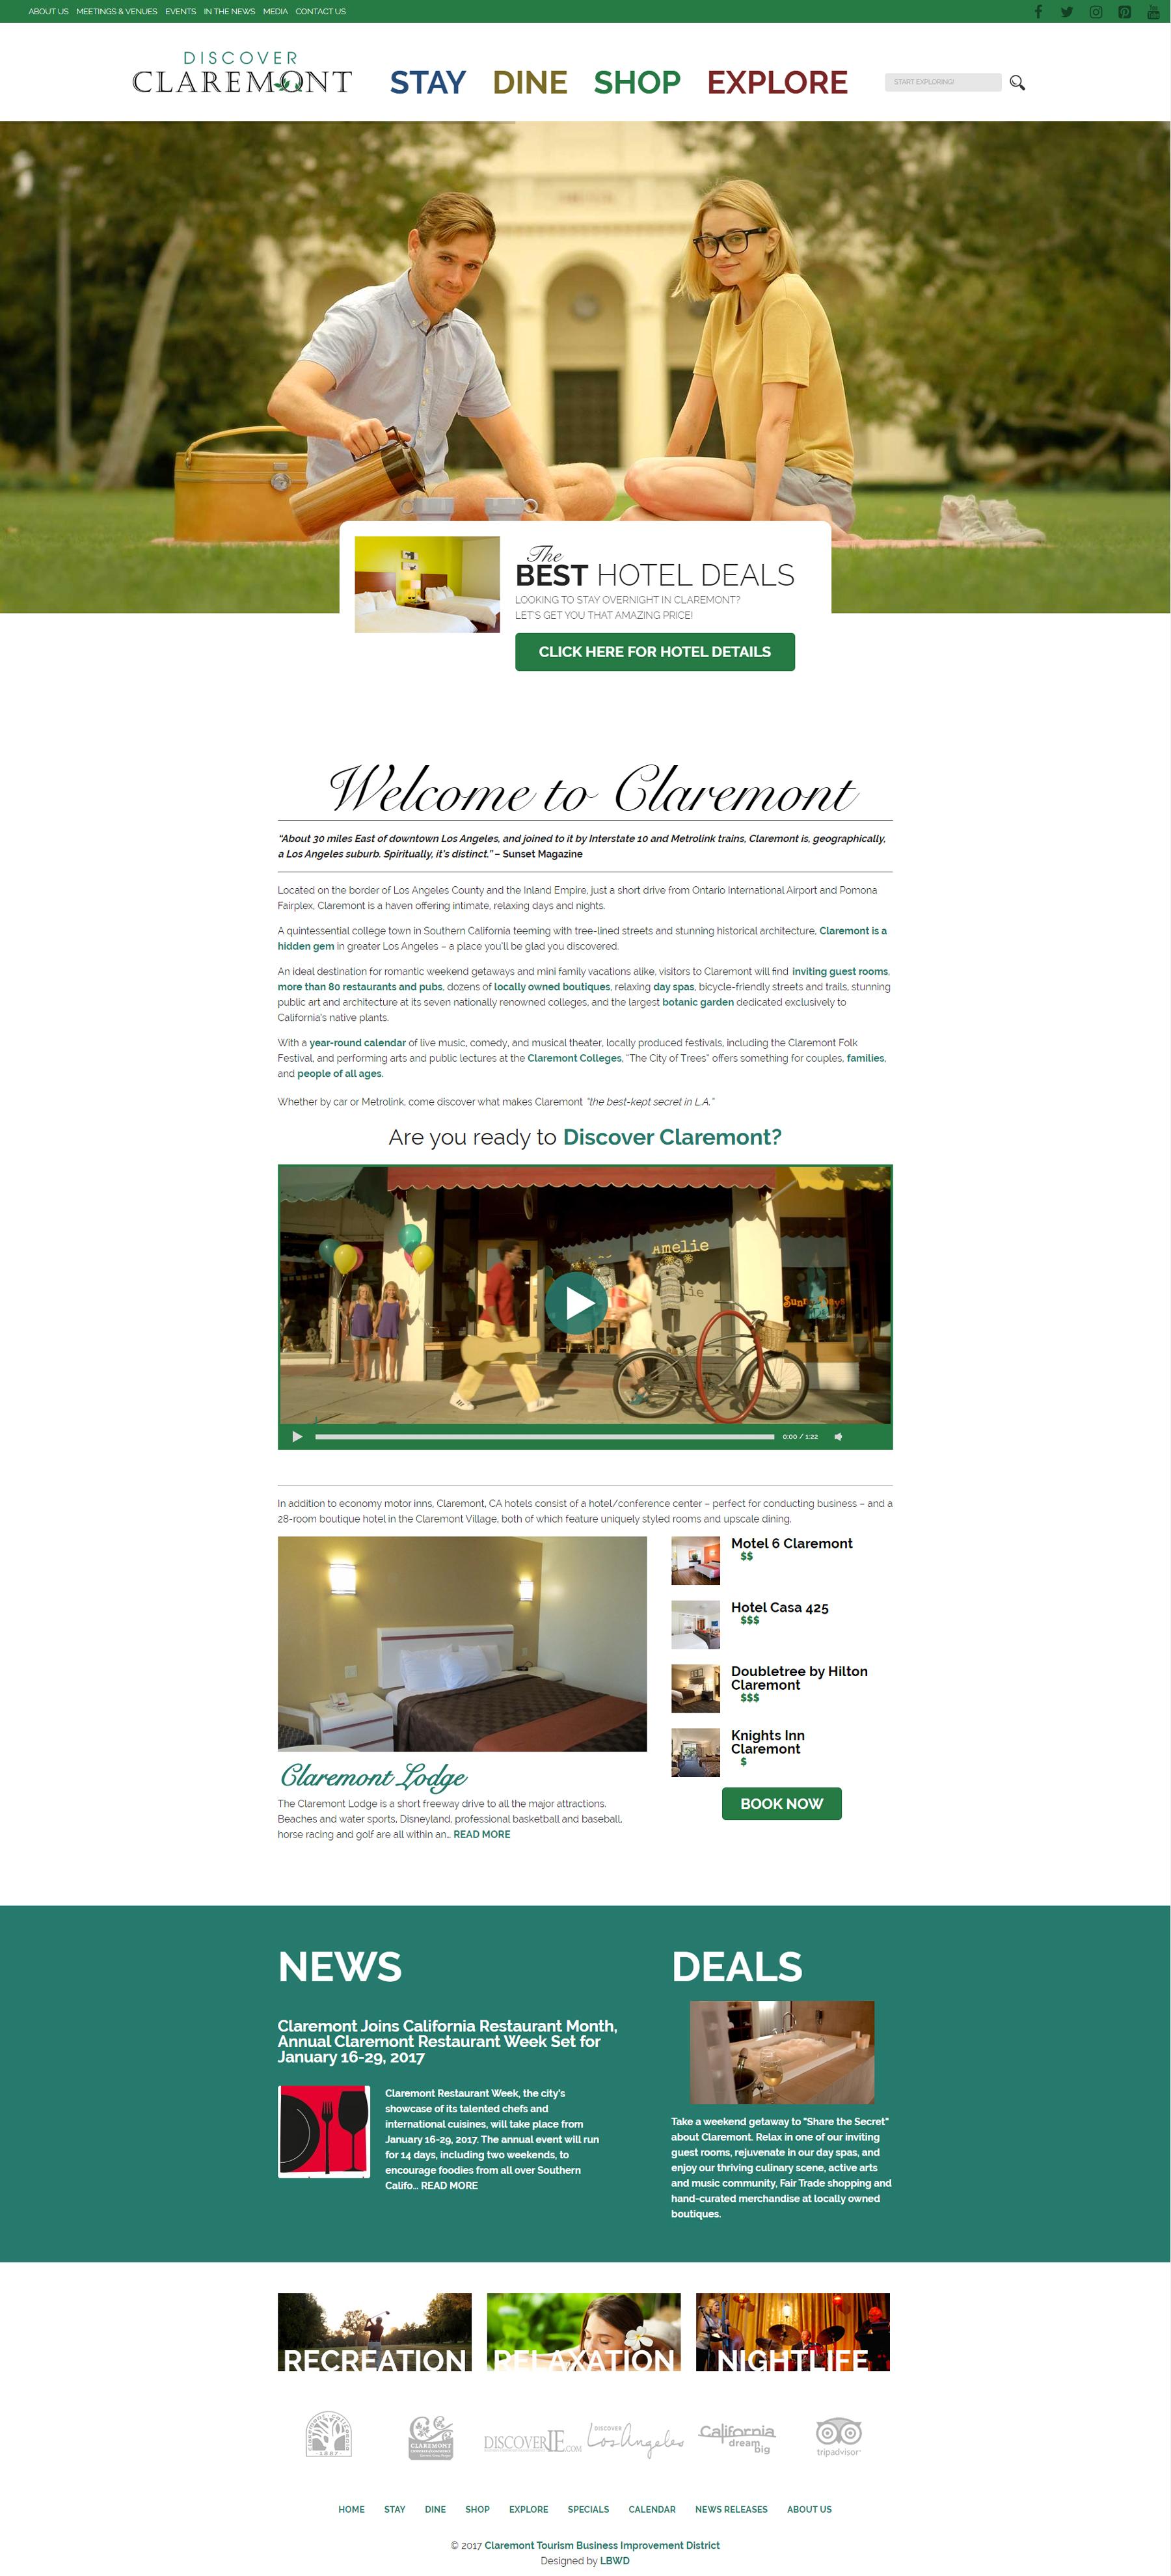 Discover Claremont Long Beach Web Design Web Design E Commerce Hosting Graphic Design In Long Beach Ca